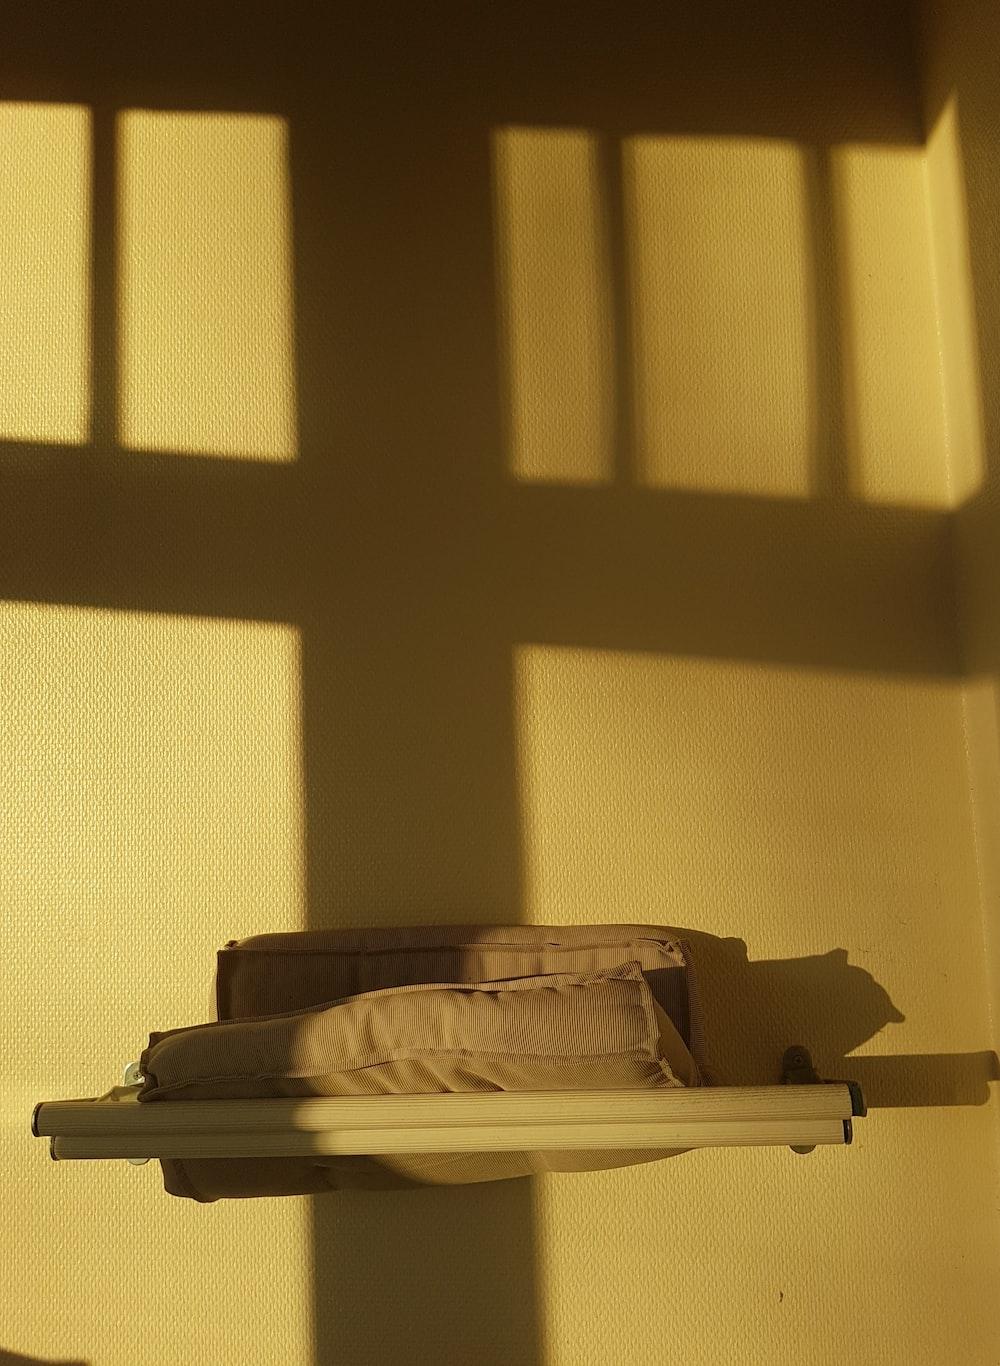 brown cushions on white wall shelf